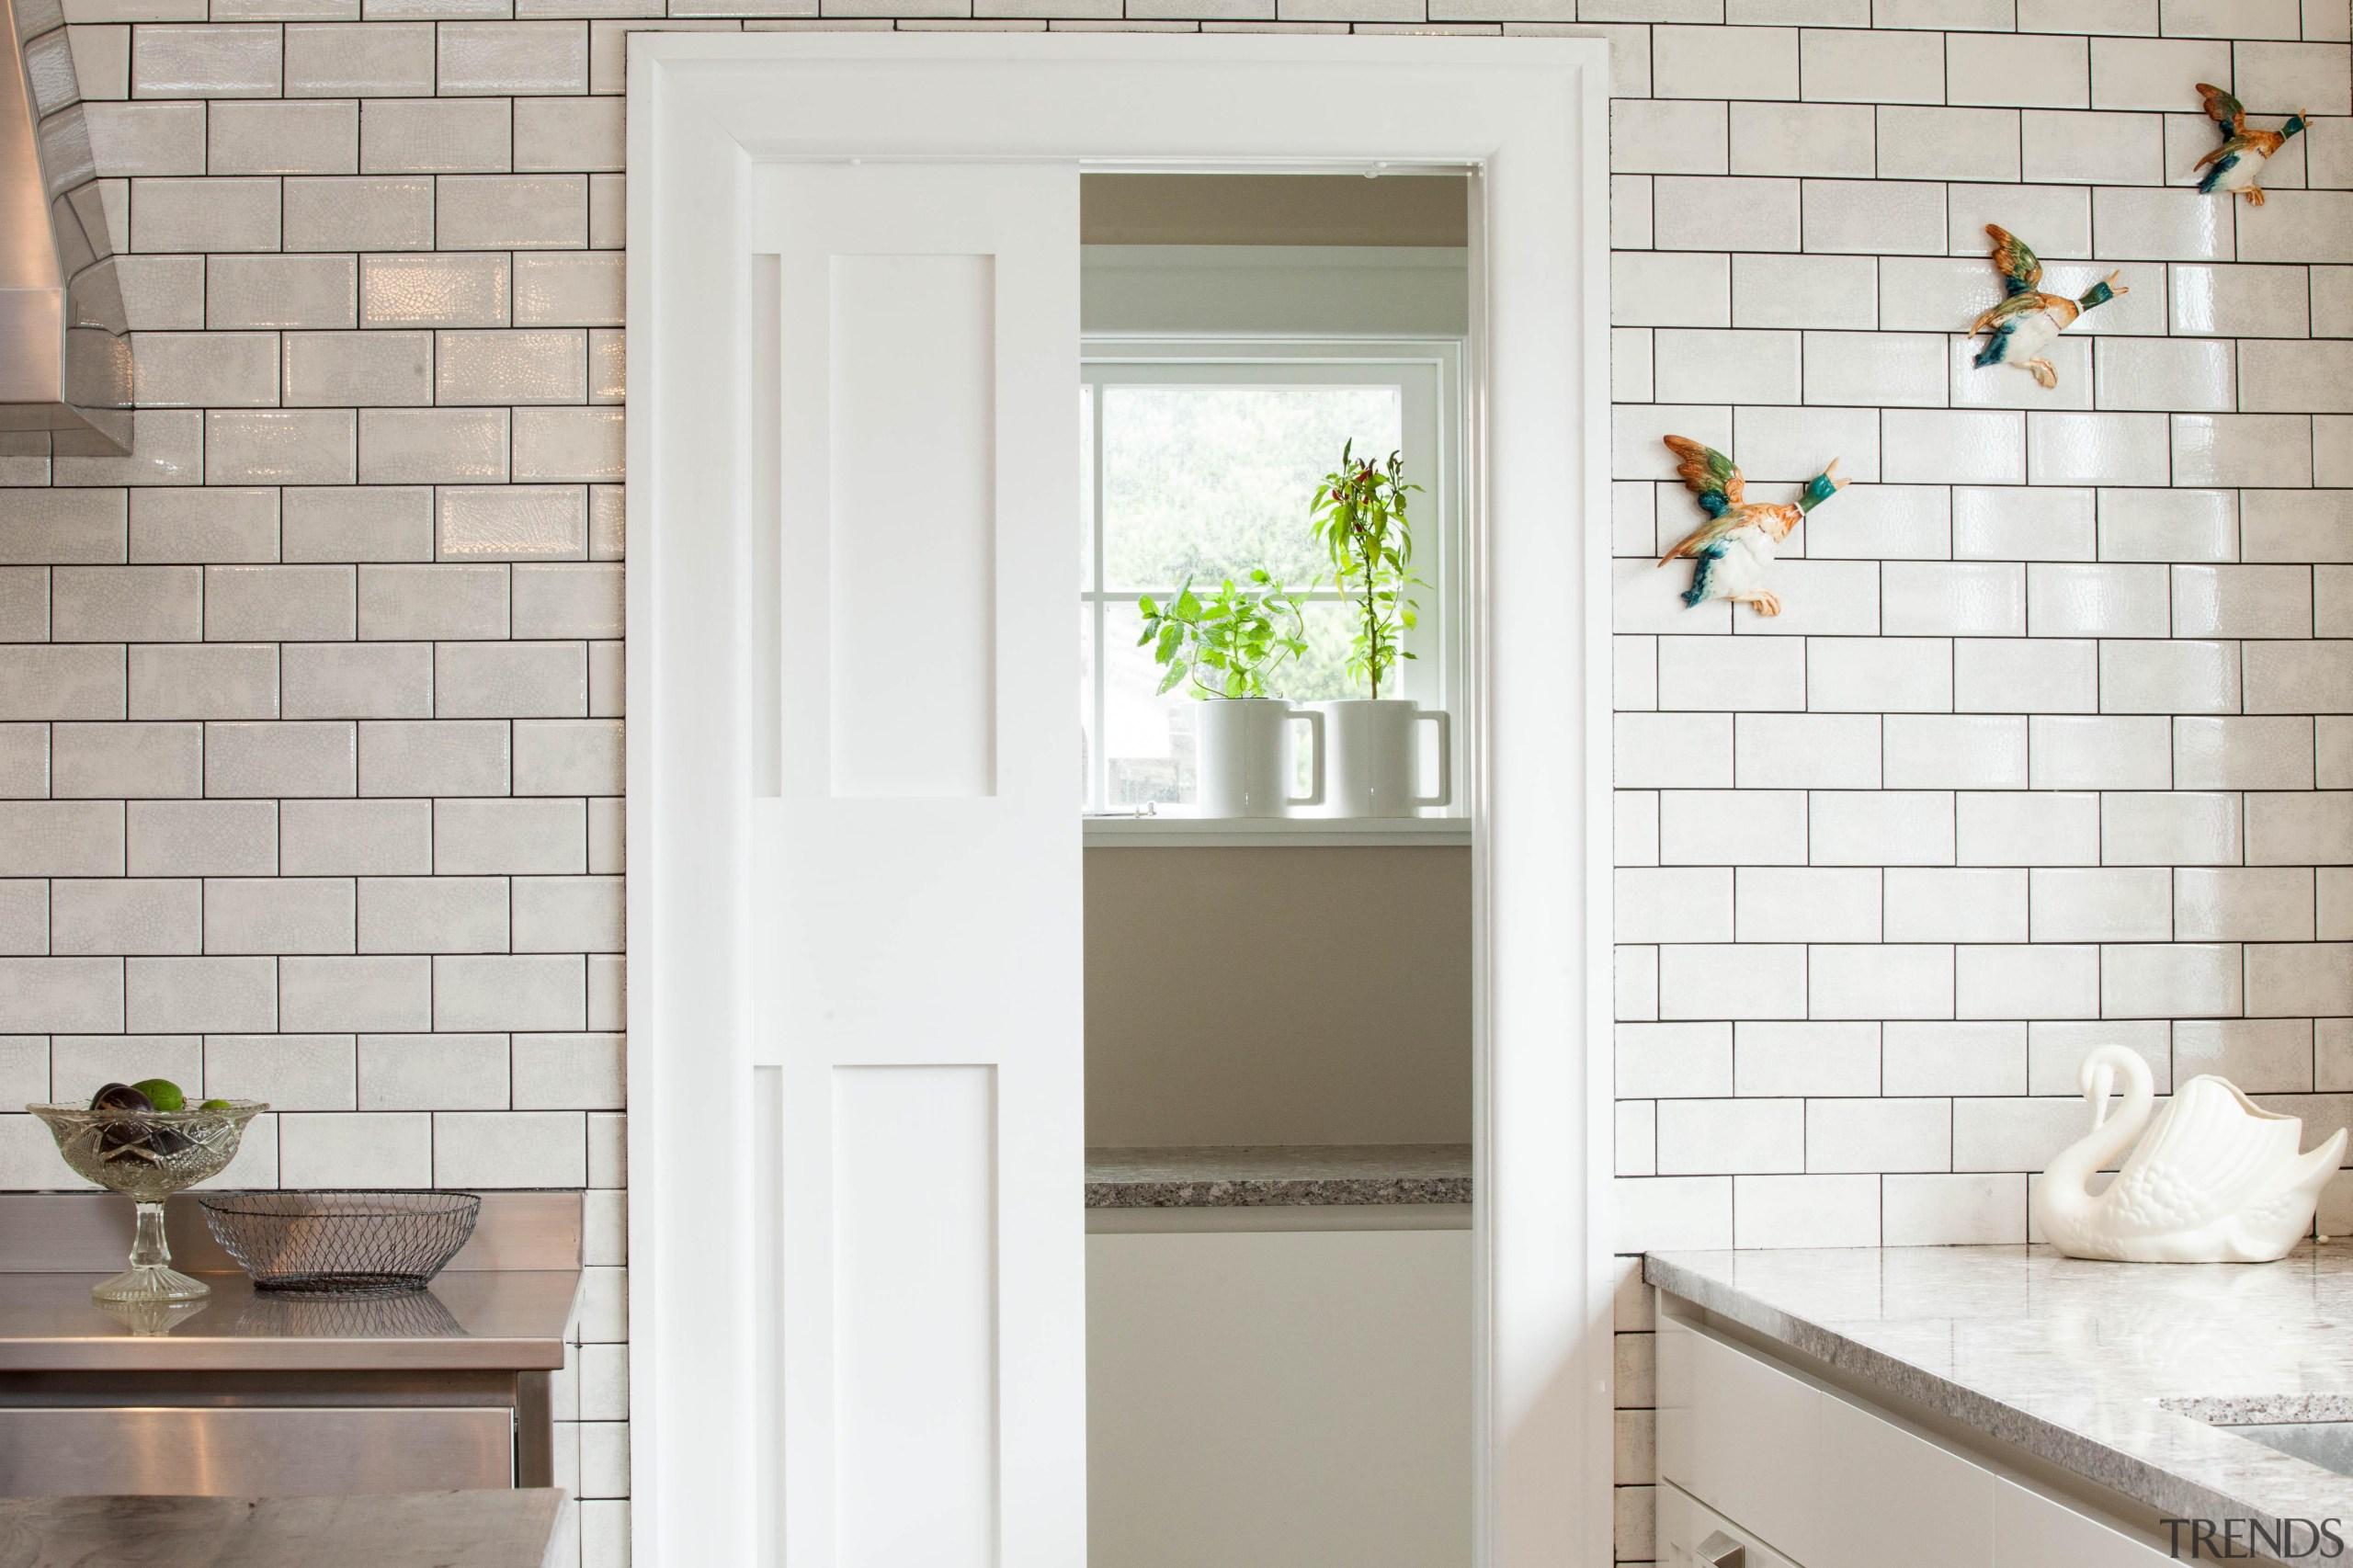 scp-14.jpg - bathroom accessory   bathroom cabinet   bathroom accessory, bathroom cabinet, door, floor, flooring, home, interior design, tap, tile, window, white, gray